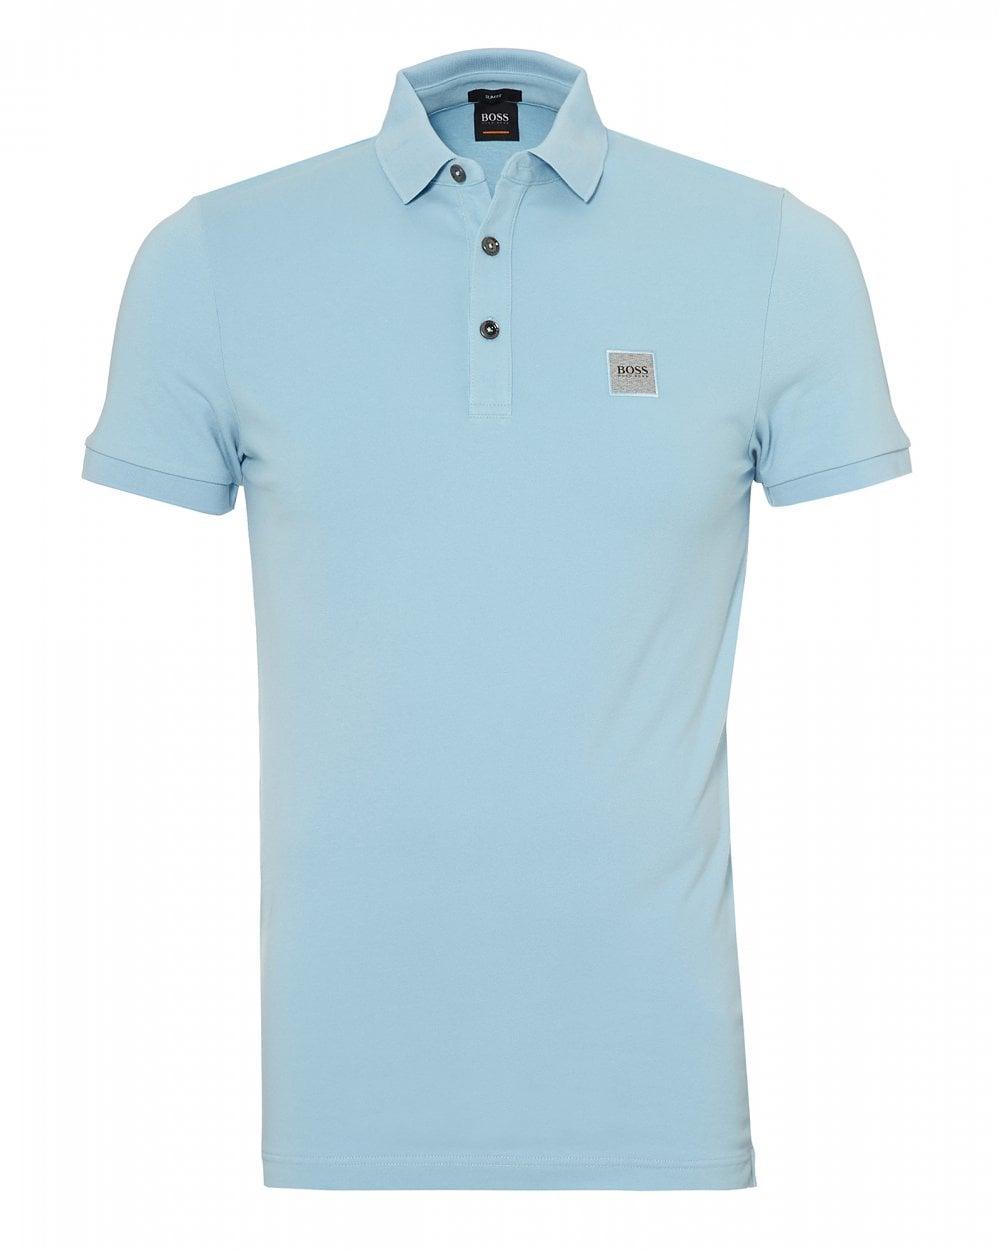 2ba900ac BOSS Casual Mens Passenger Polo Shirt, Slim Fit Sky Blue Polo